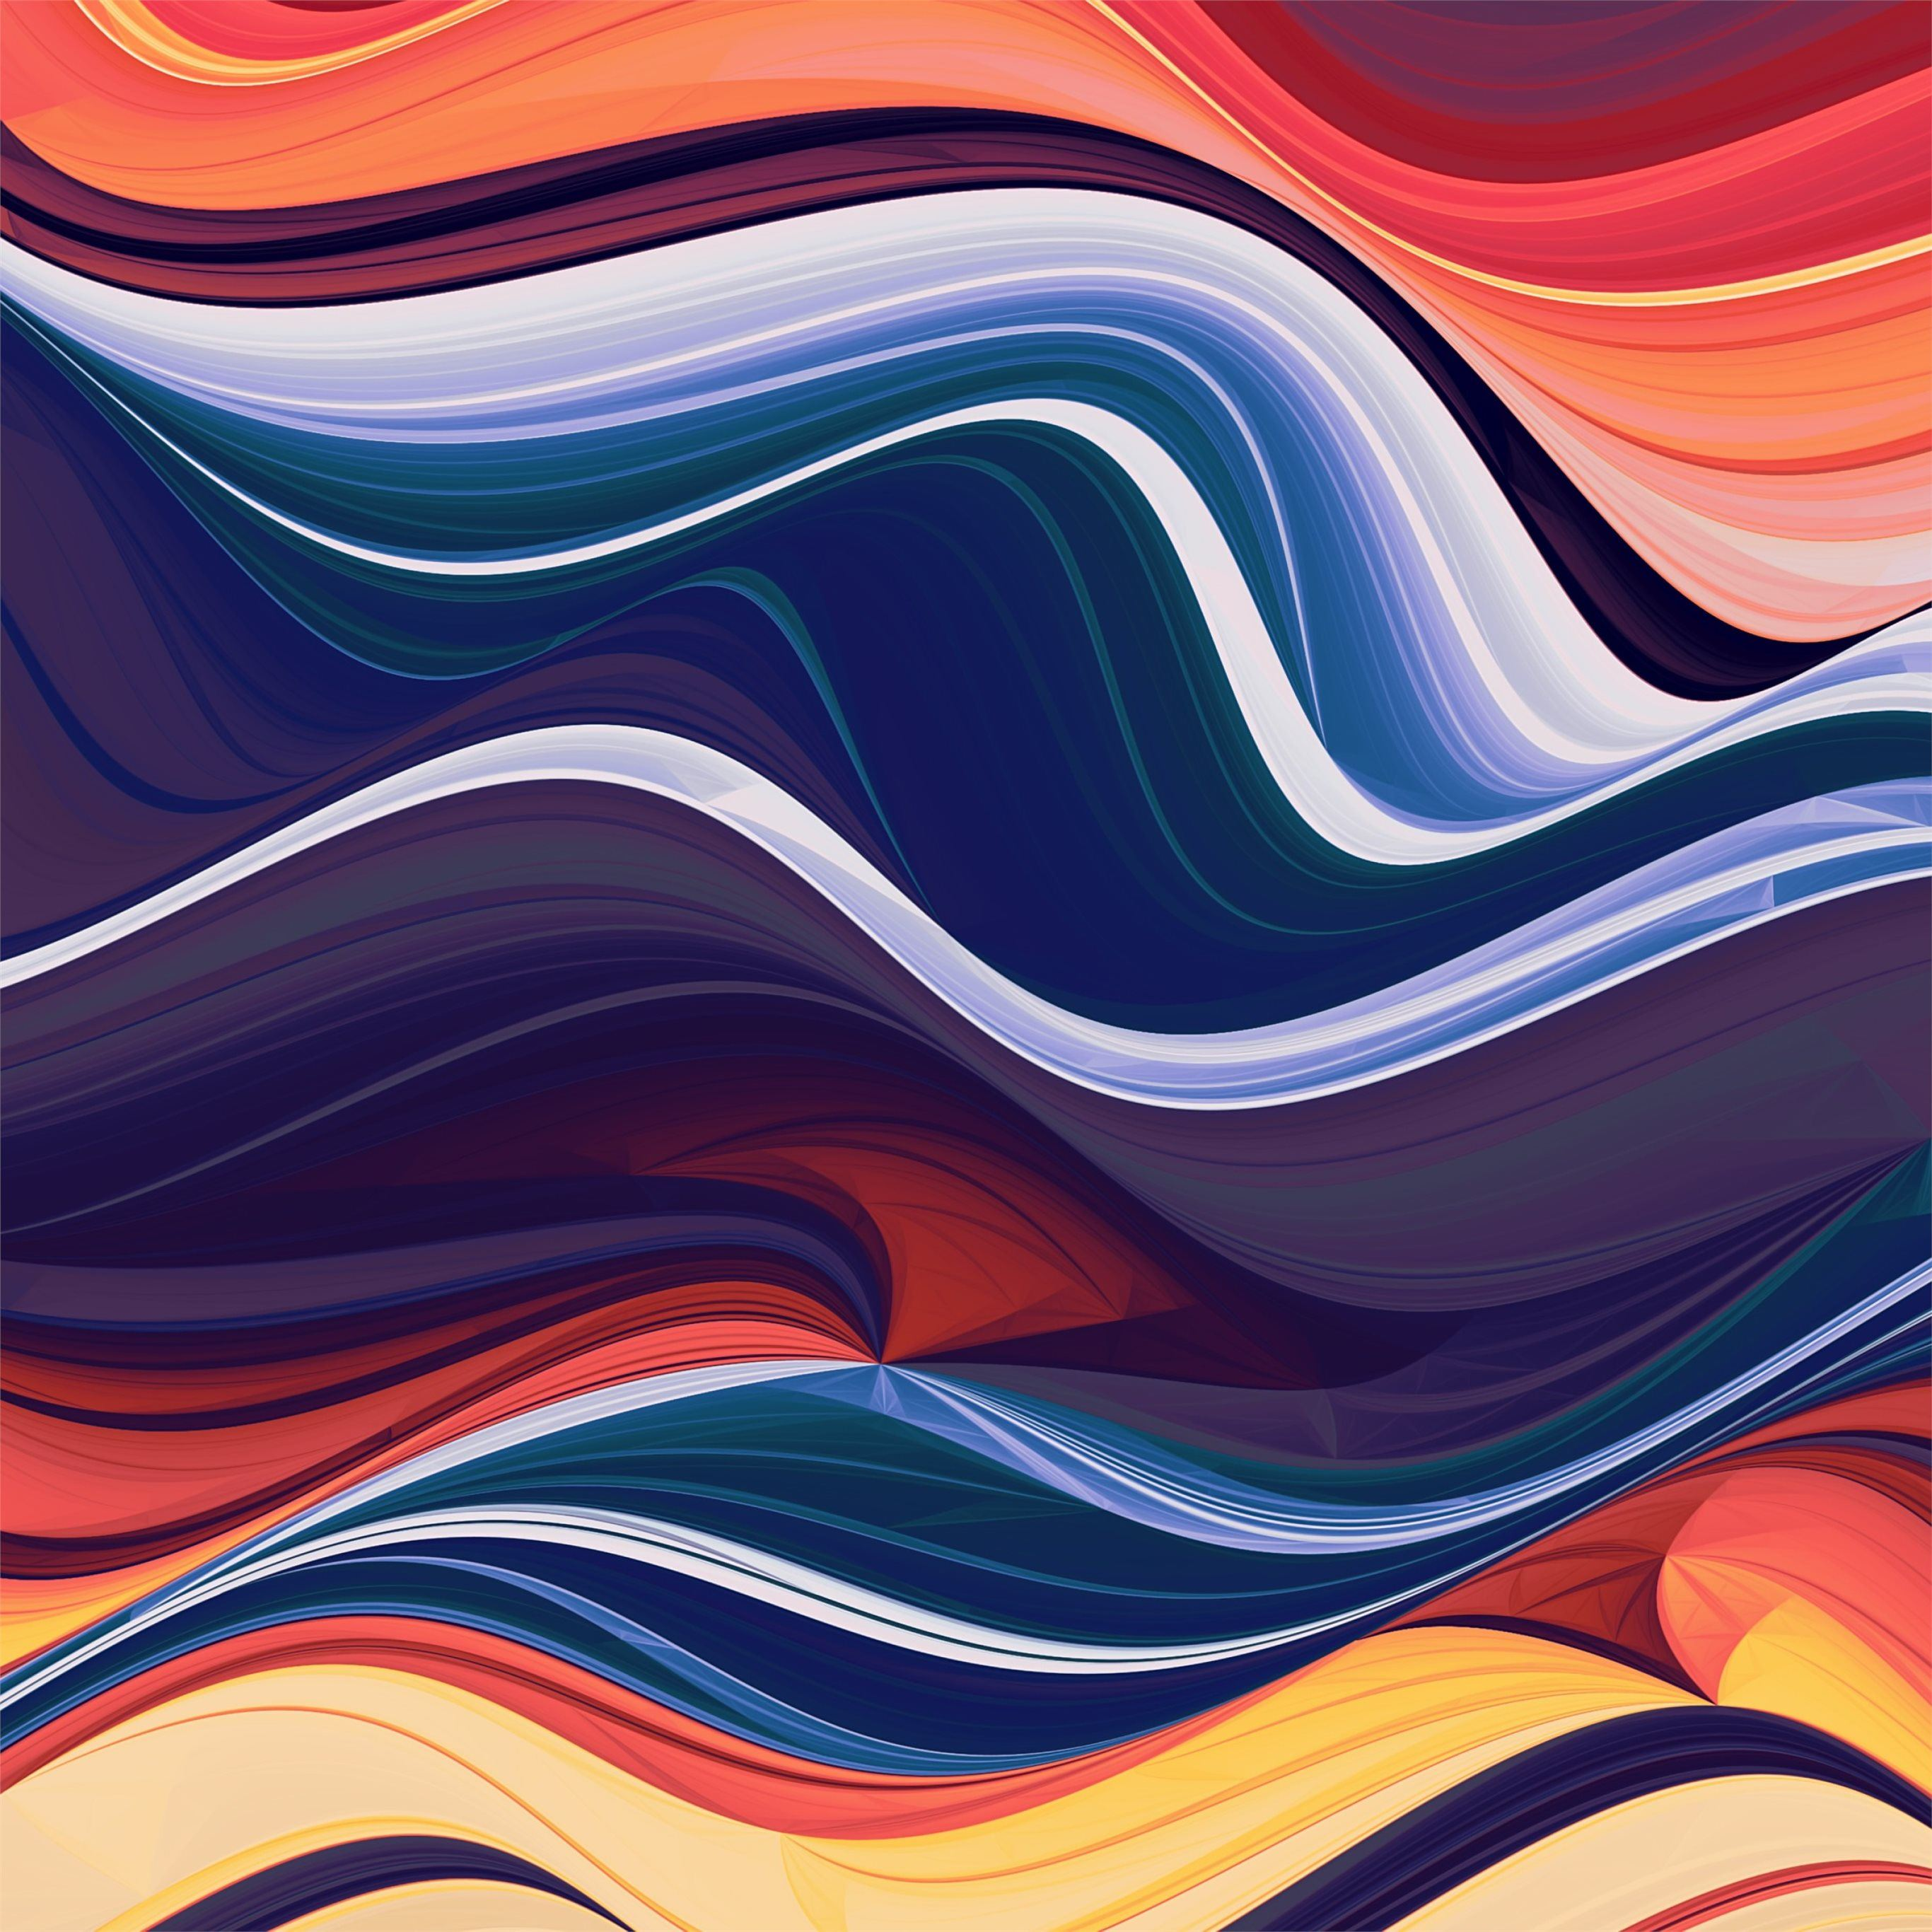 Best Colorful Ipad Pro Wallpapers Hd 2020 Ilikewallpaper